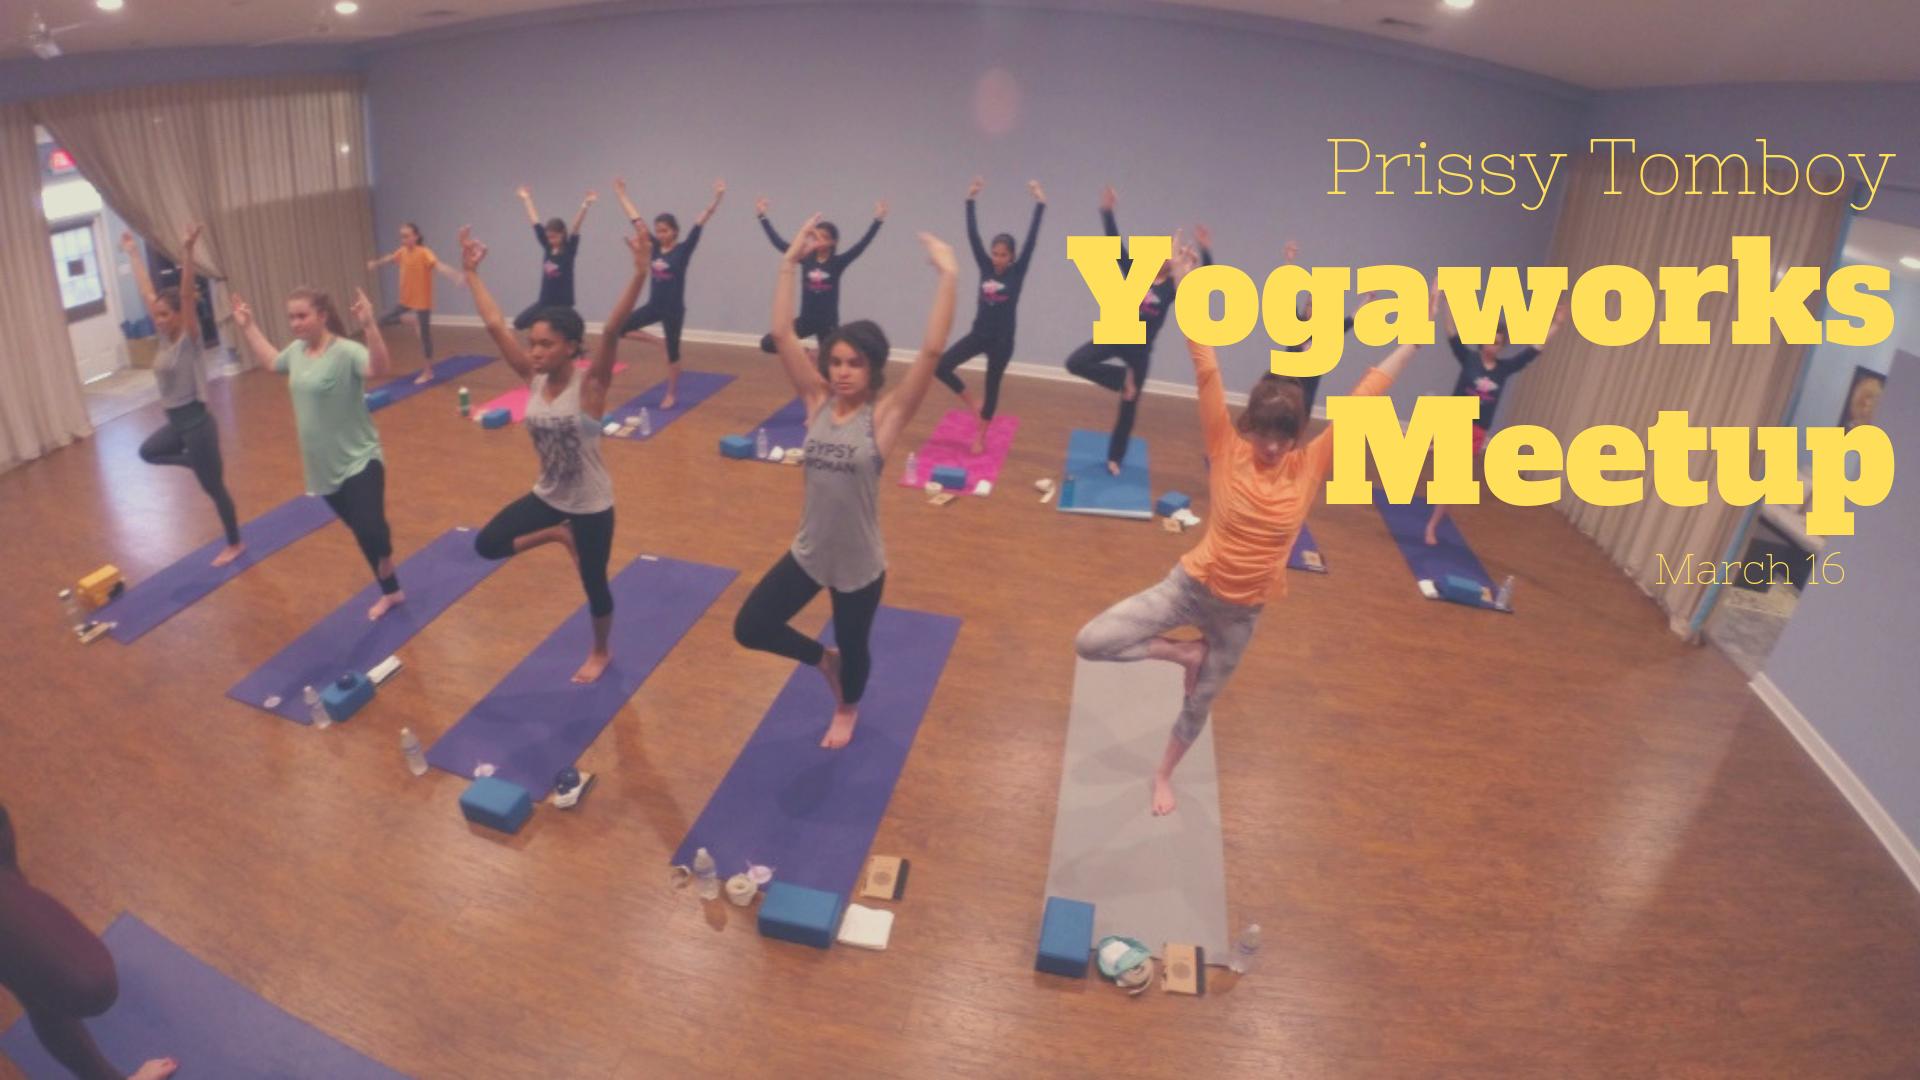 yogaworks.png